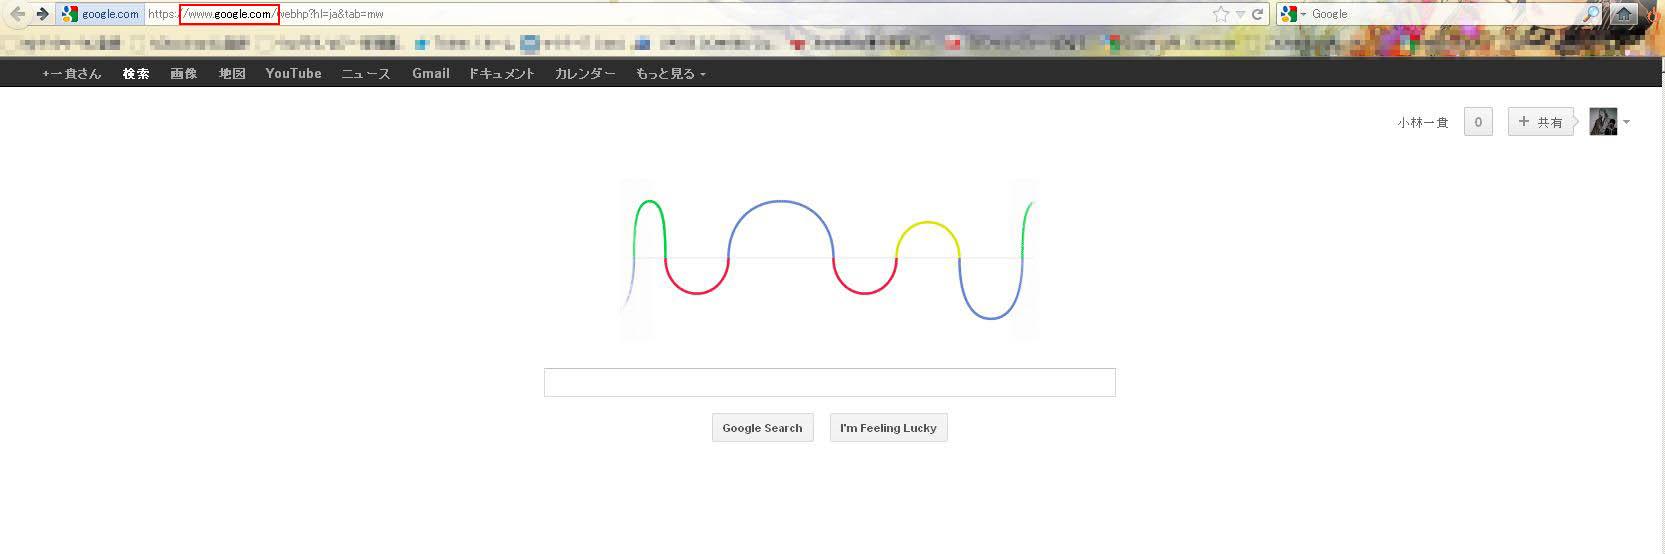 google.comの検索入力画面